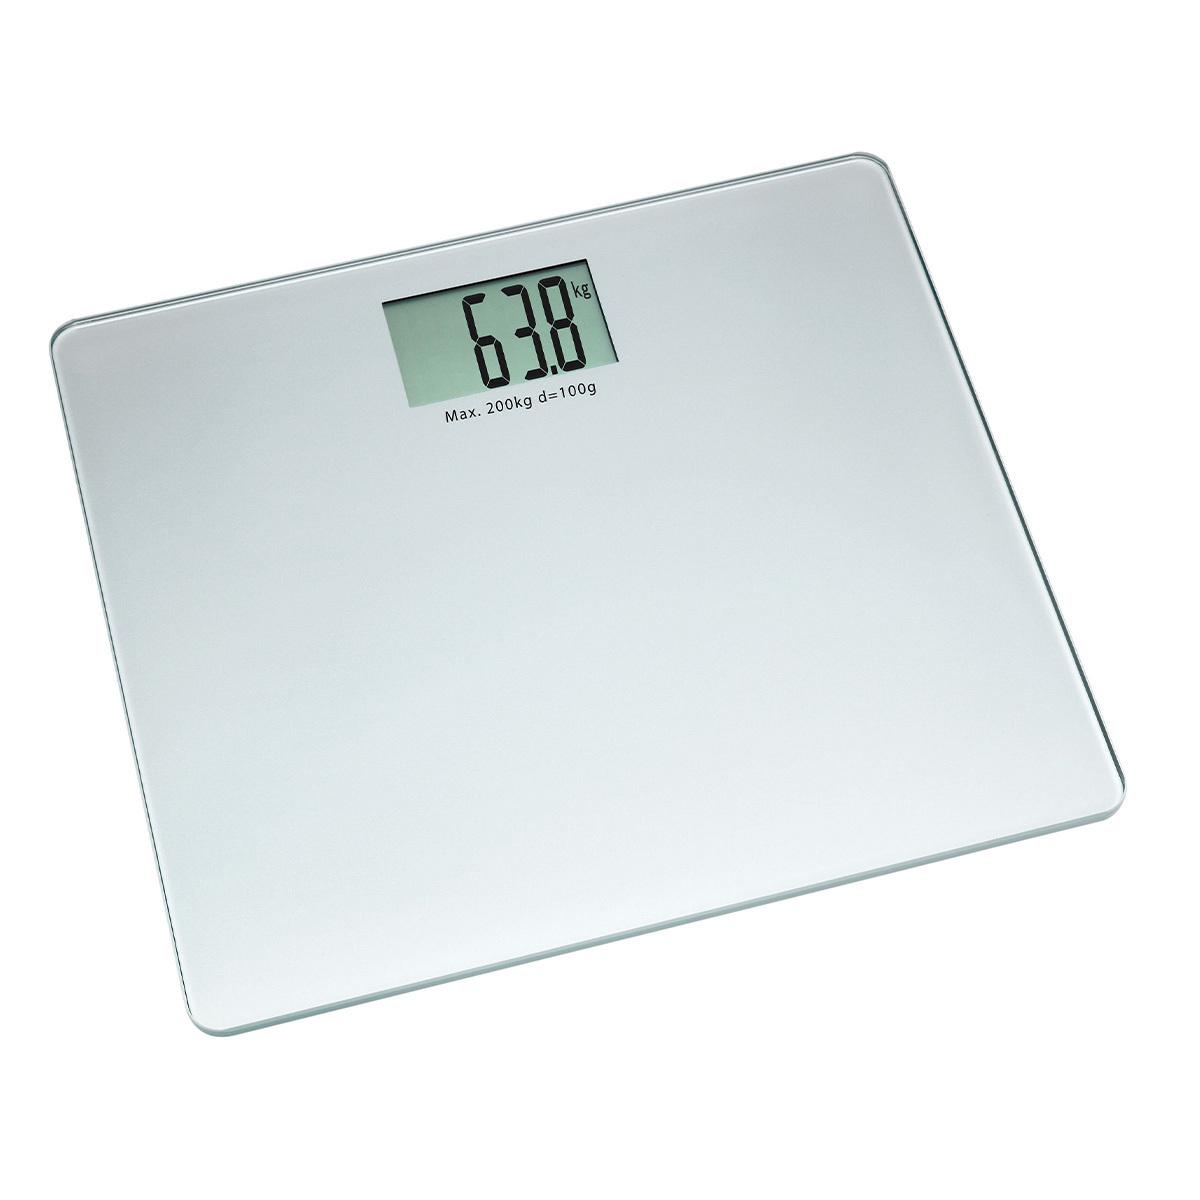 50-1010-54-digitale-xxl-personenwaage-glas-big-step-1200x1200px.jpg